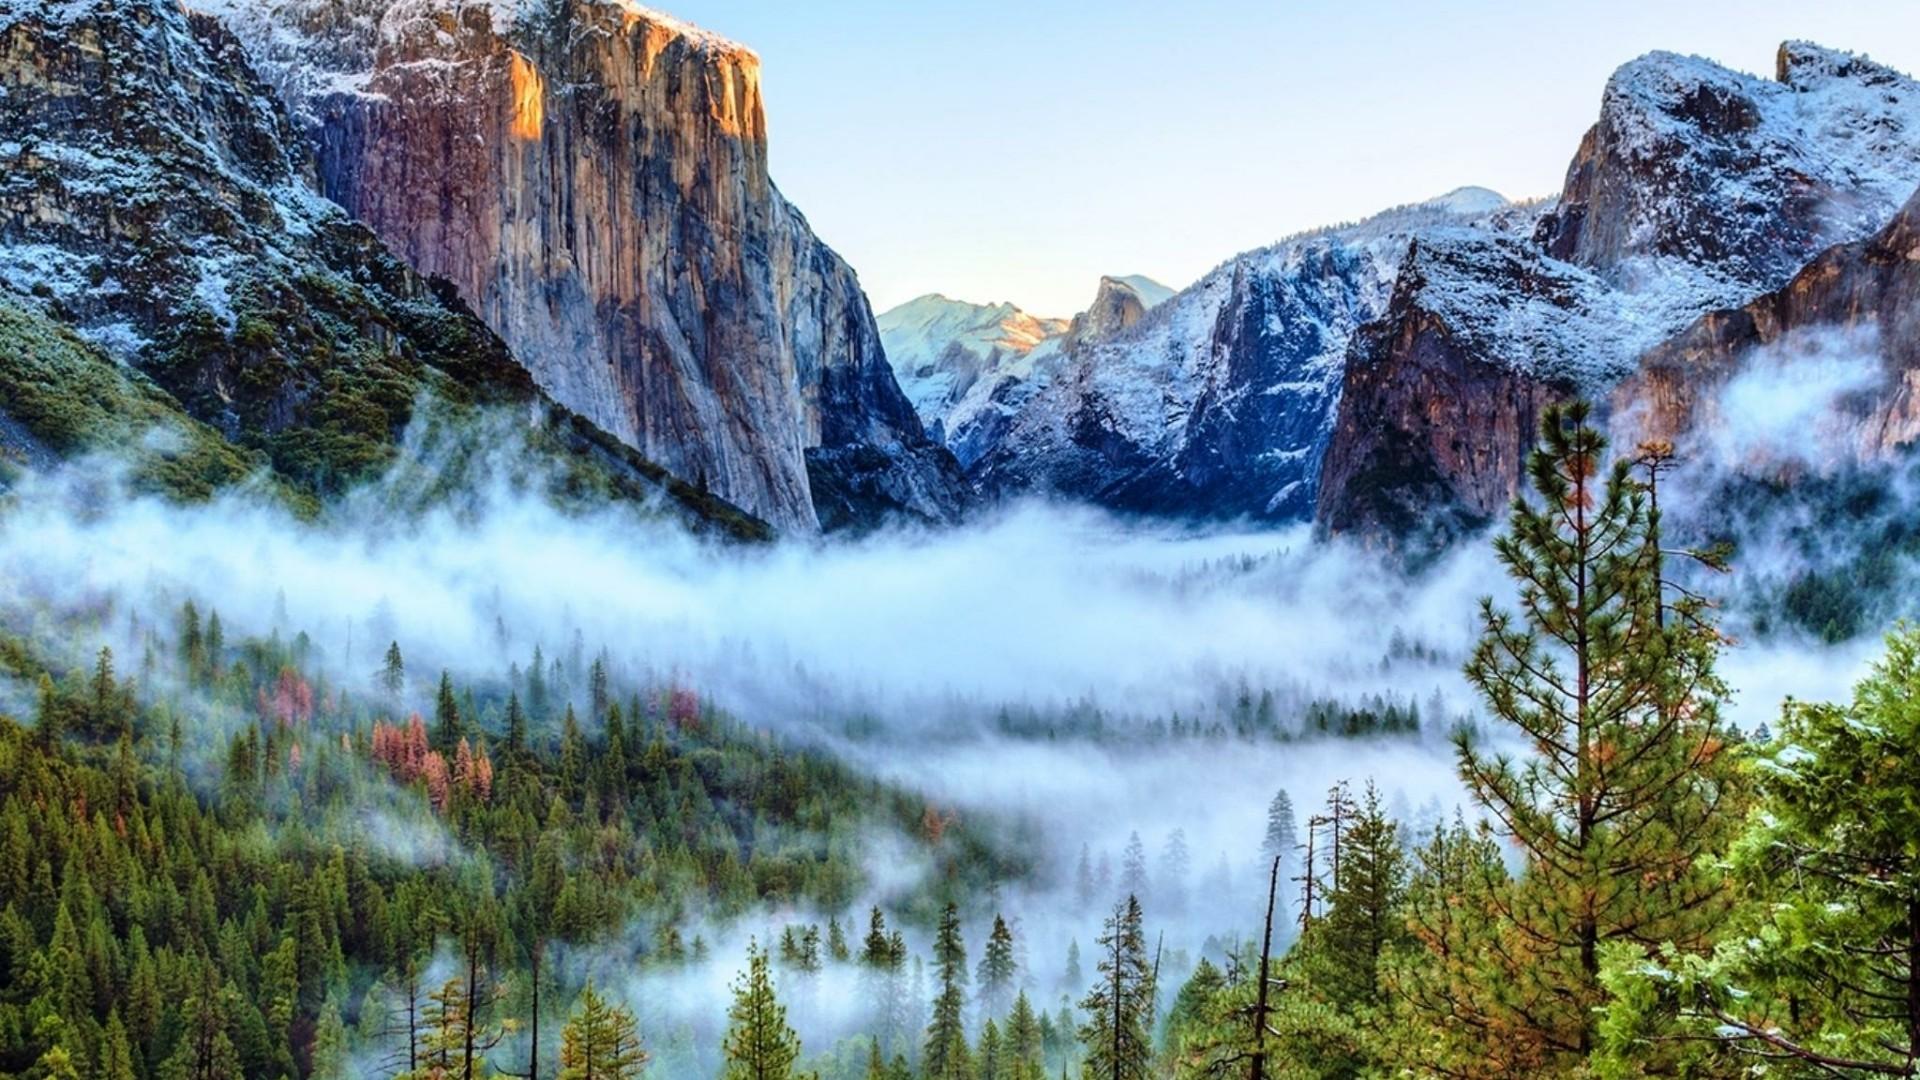 Tunnel view of foggy Yosemite Valley, Yosemite National Park wallpaper